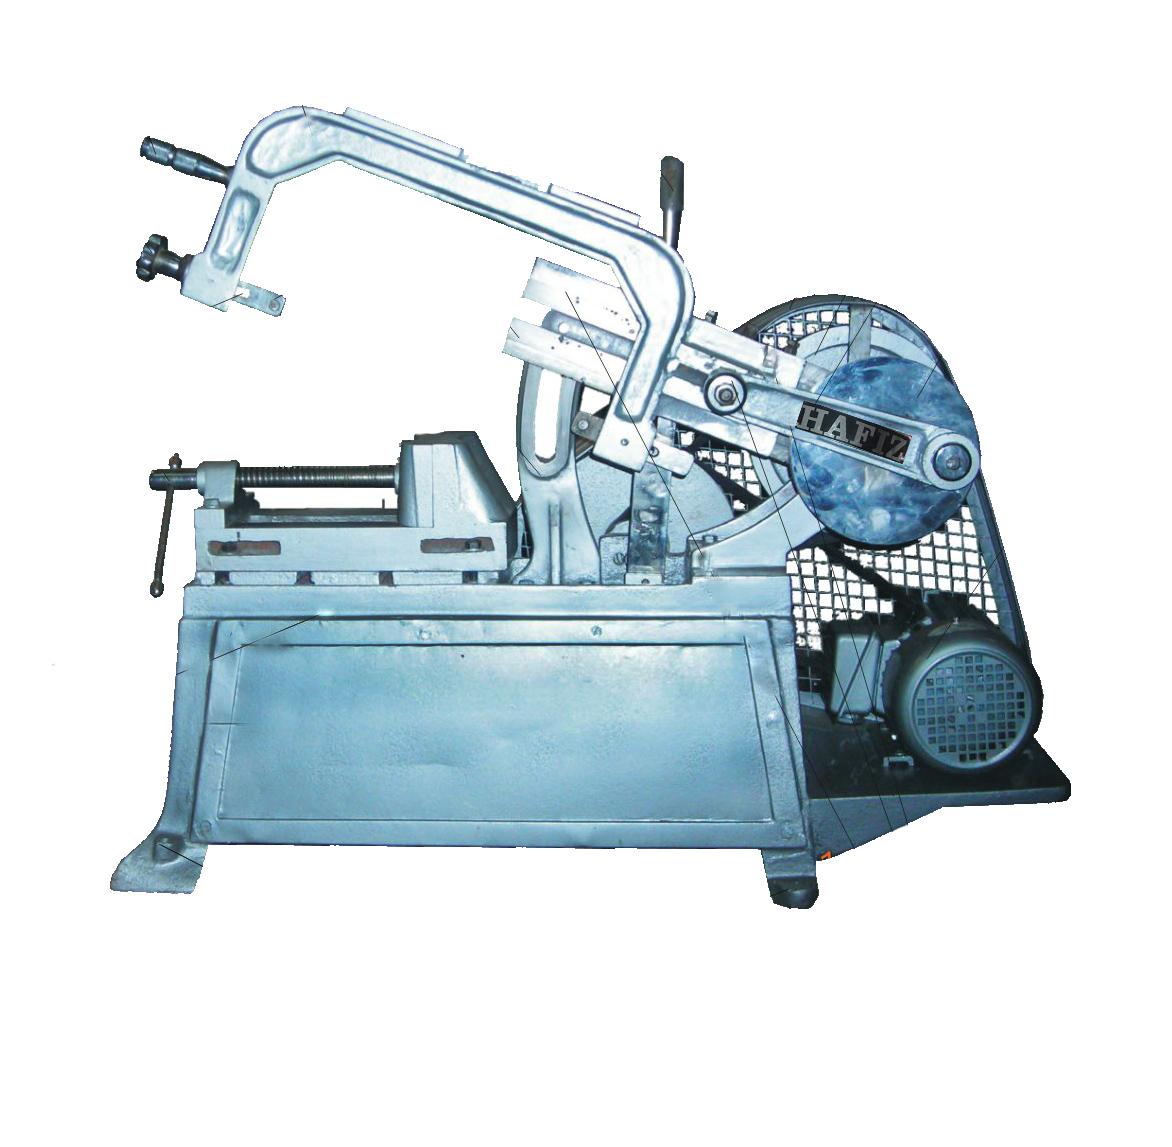 Hafiz Lathe Machines Pakistan